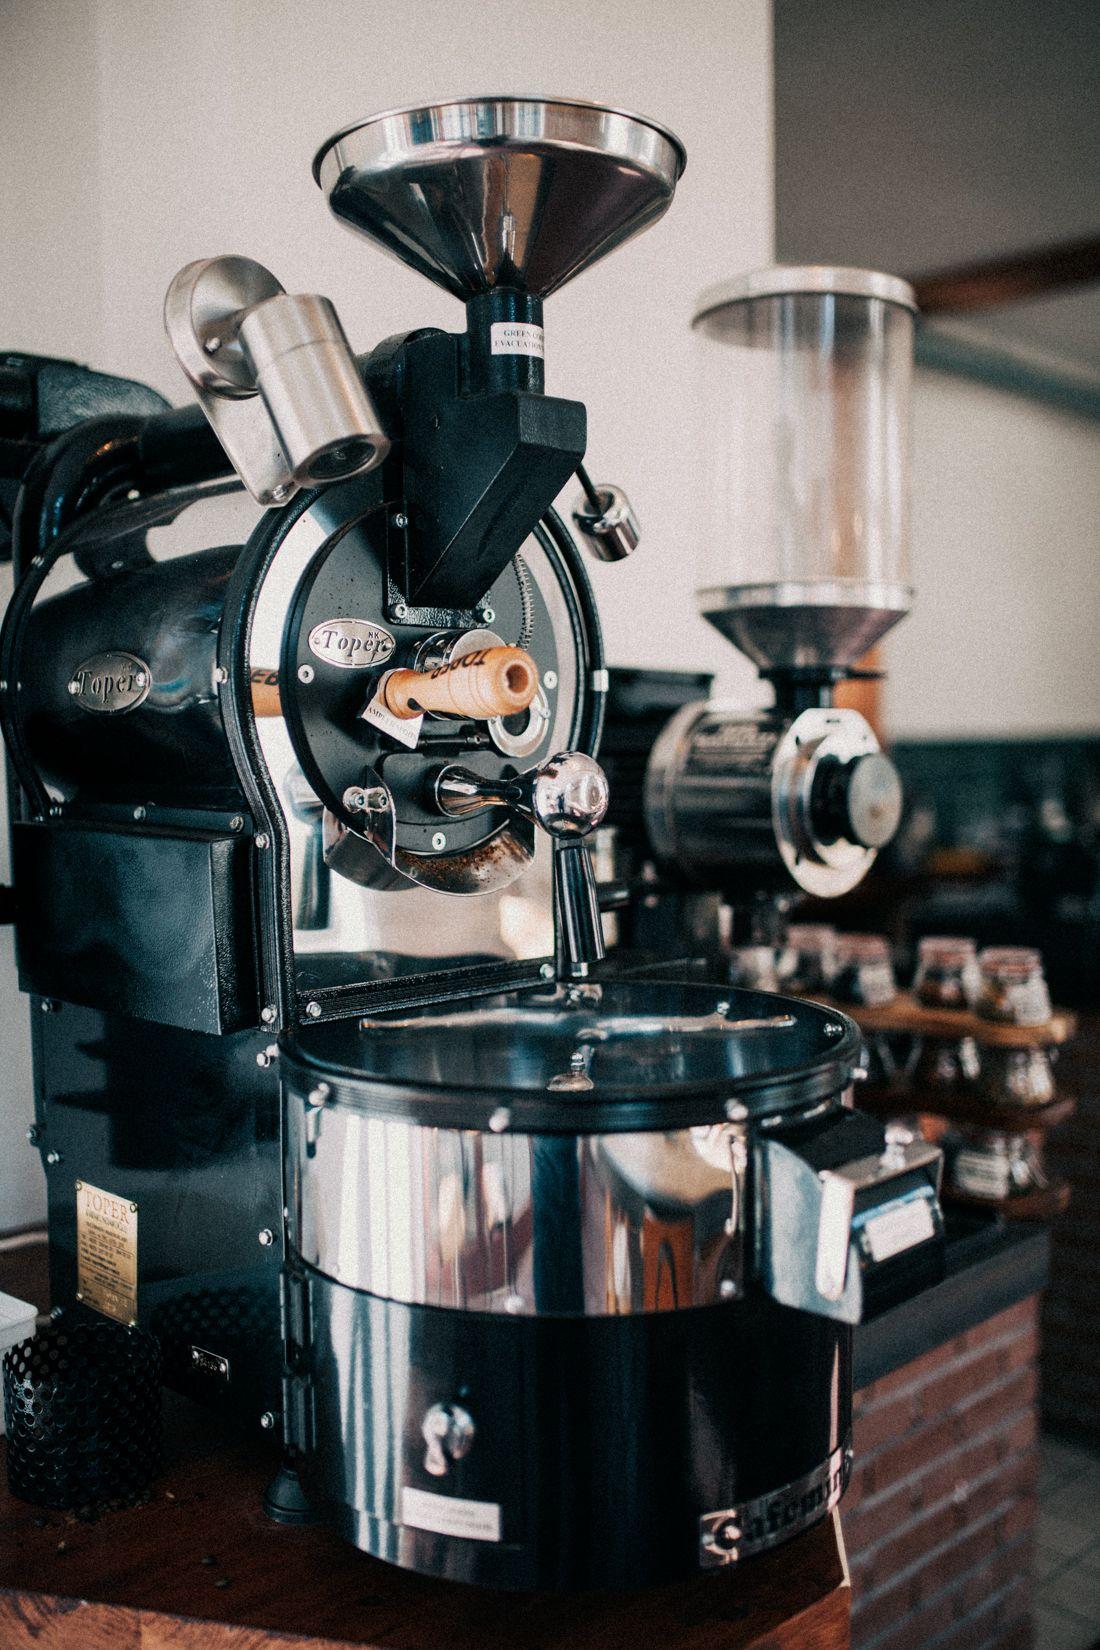 Toper Coffee Roaster Coffeehouse Schenkers Apeldoorn The